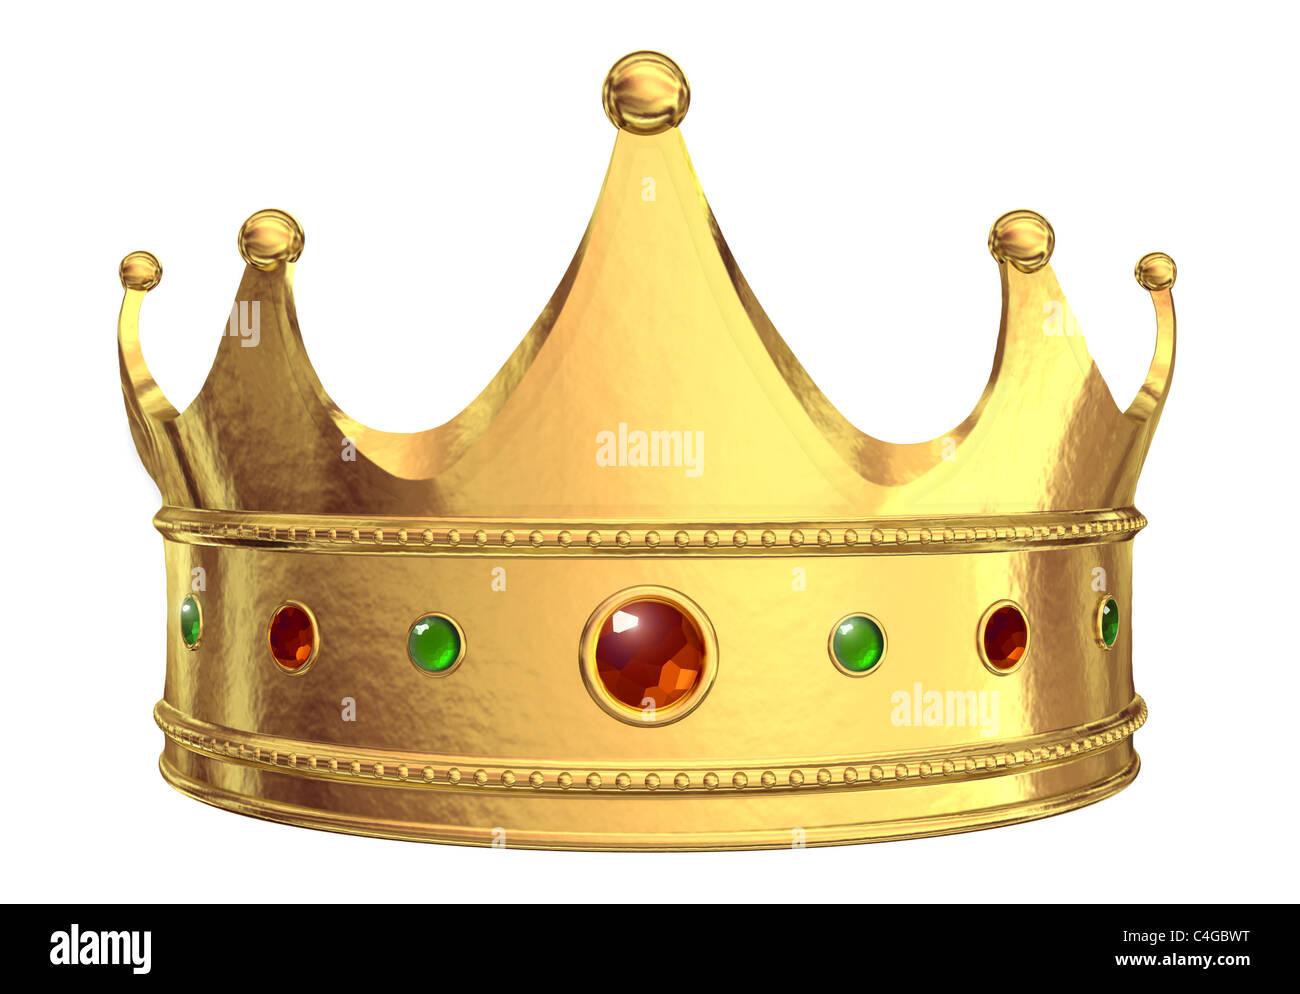 Krone Corona